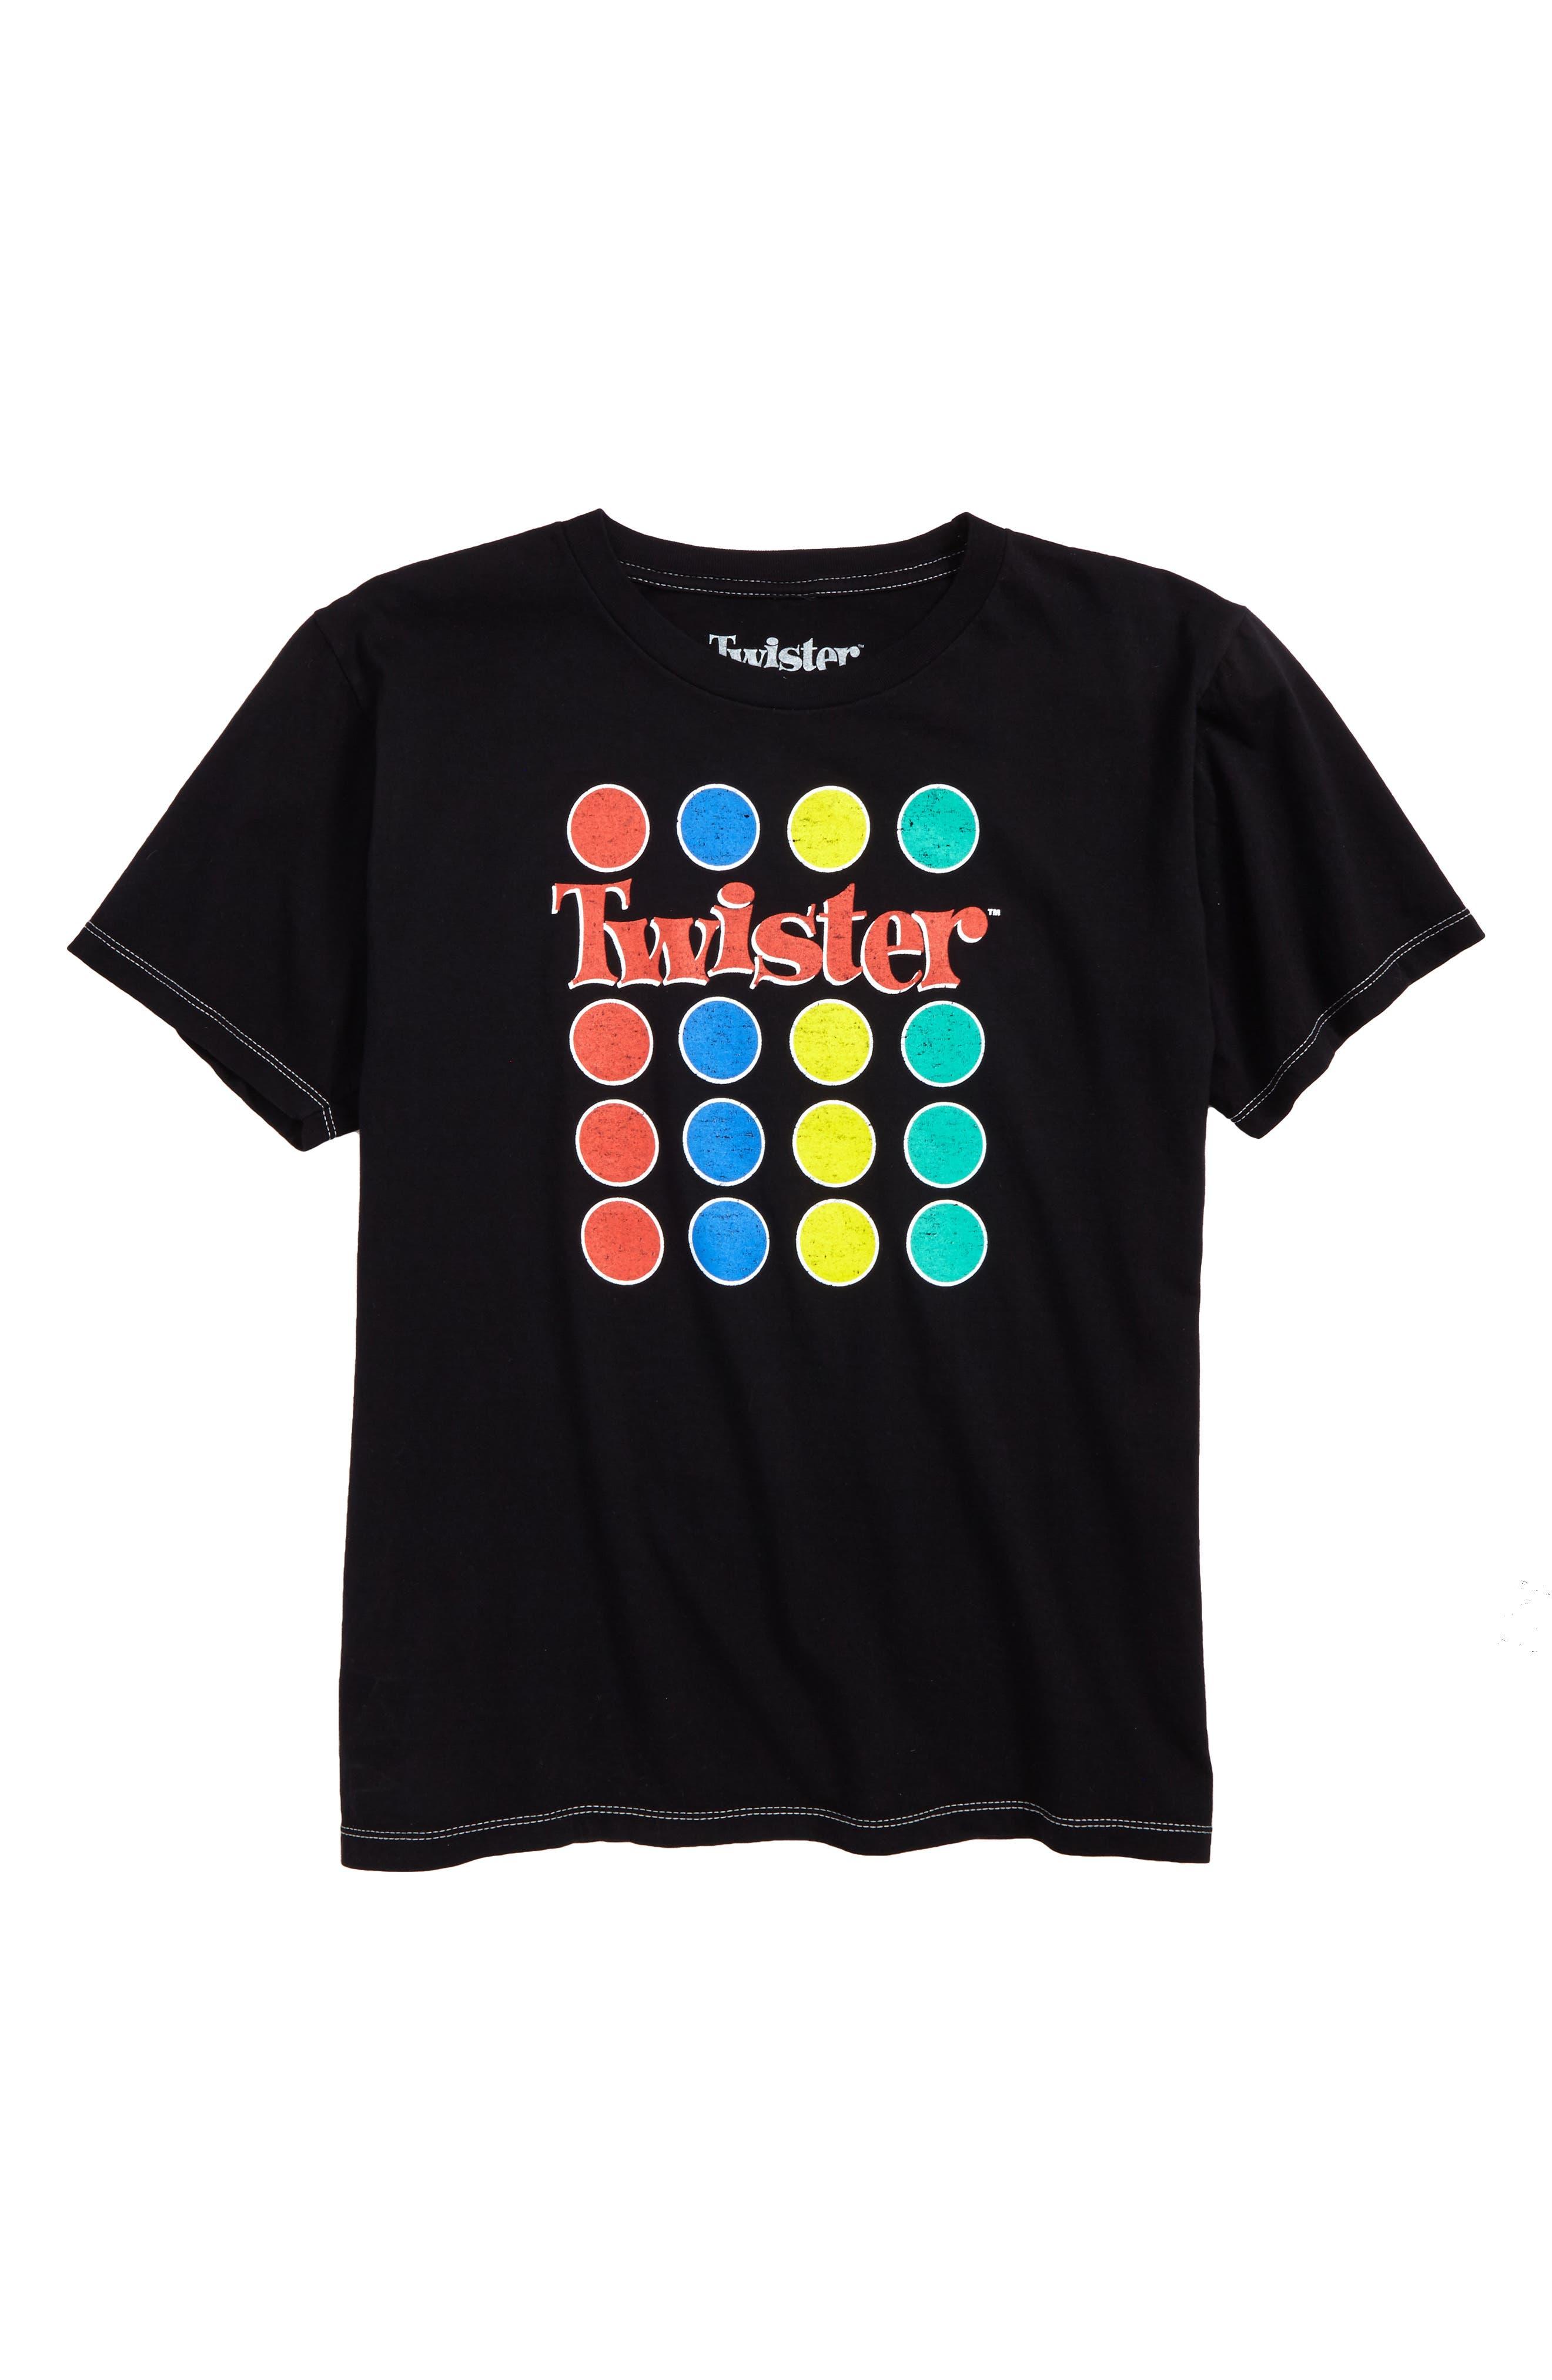 Alternate Image 1 Selected - Jem Twister Graphic T-Shirt (Big Boys)